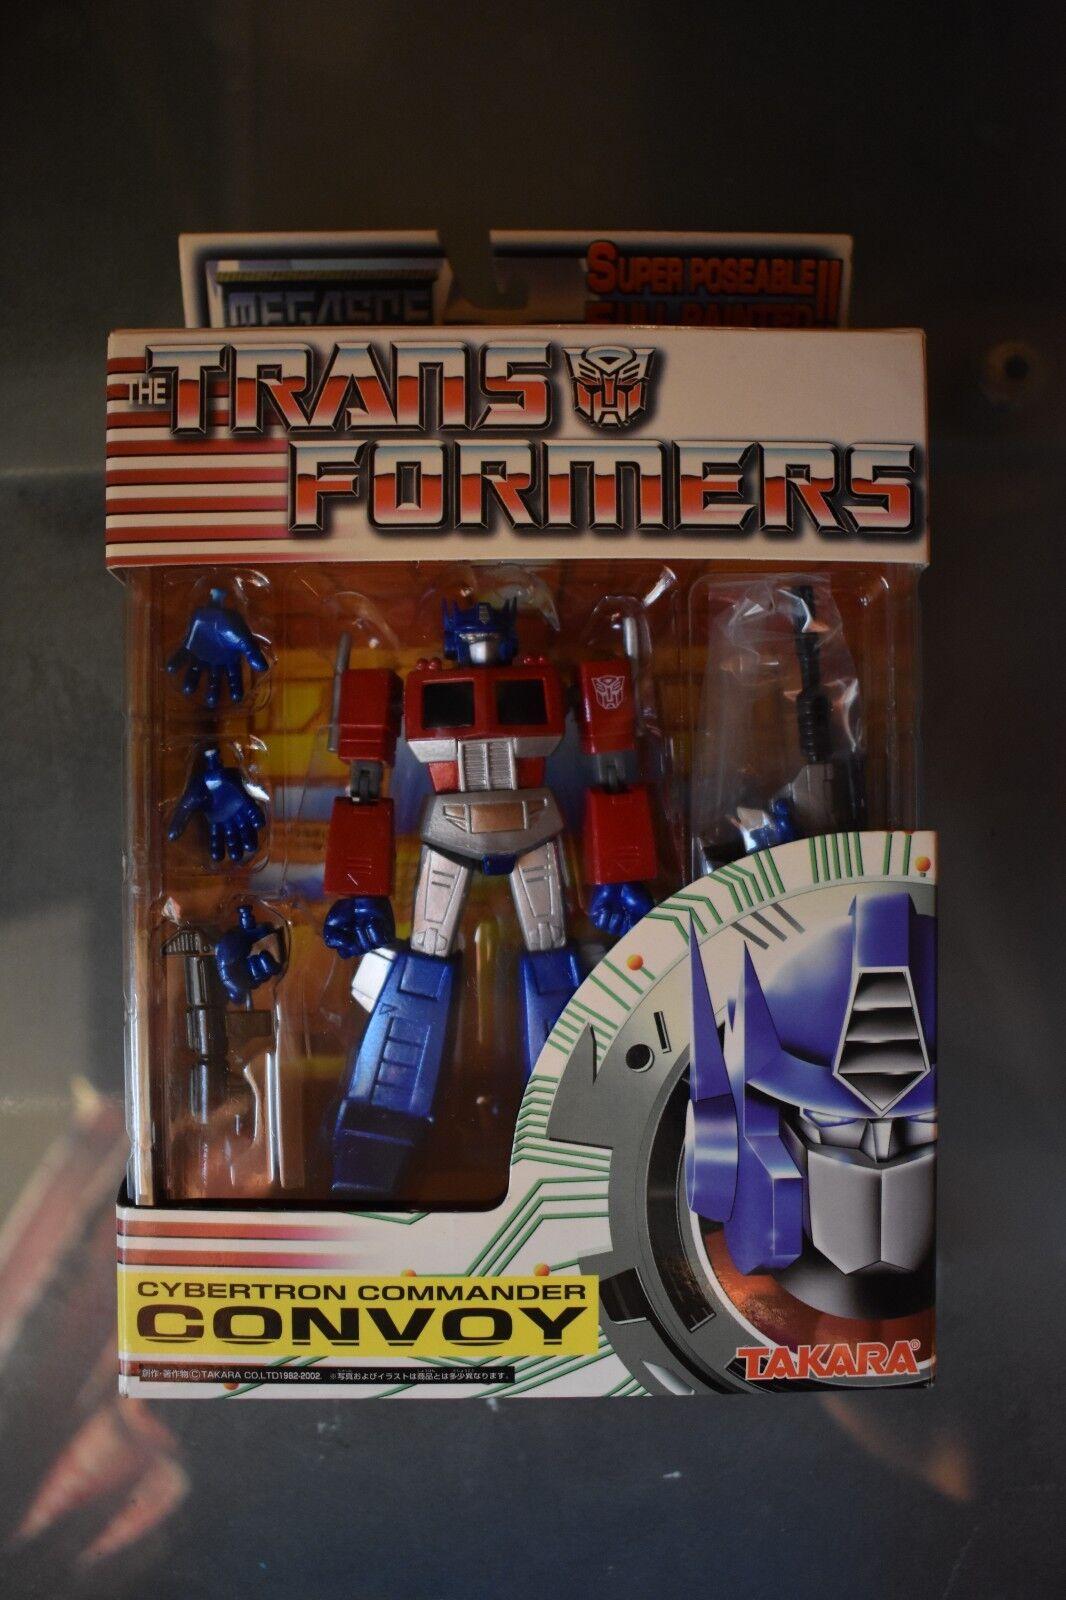 Optimus Prime   Convoy  MegaSCF  G1 Transformers Takara Cybertron Comuomoder NIB  grandi prezzi scontati